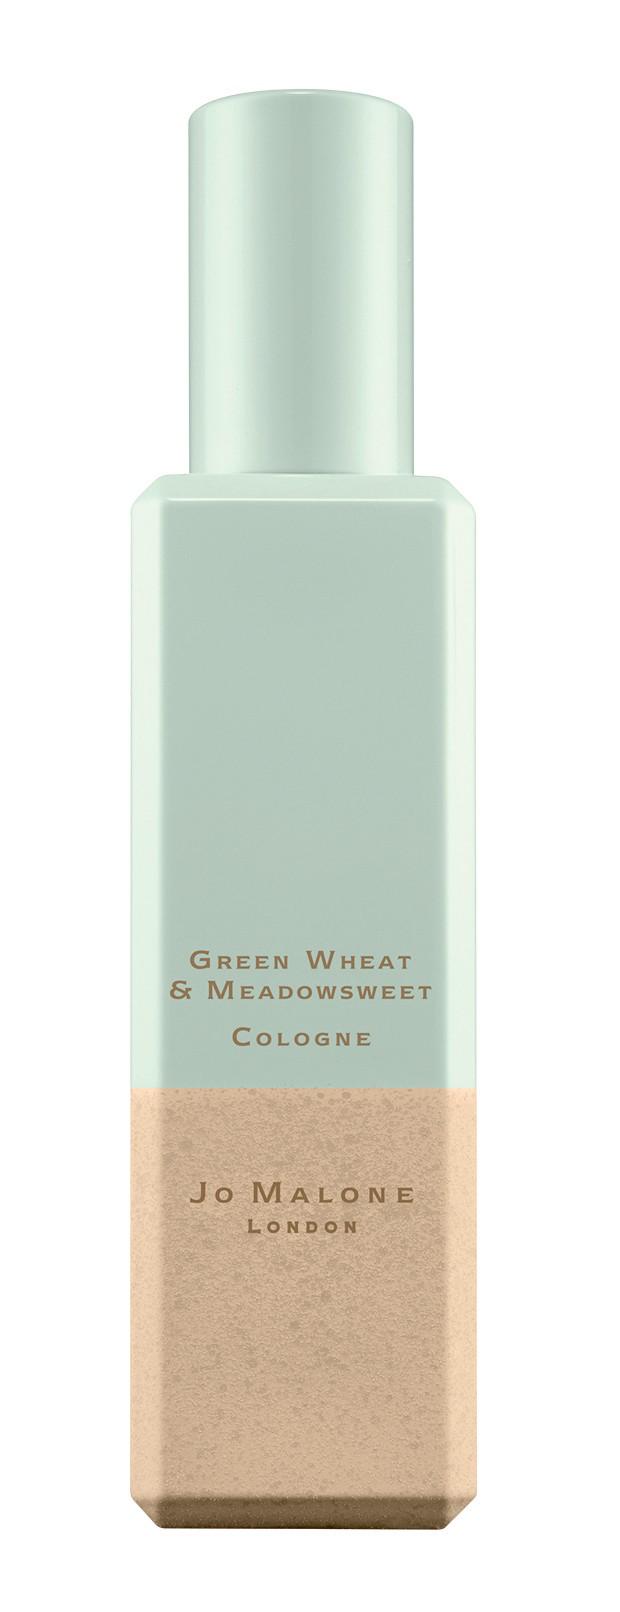 Colônia Green Wheat & Meadowsweet, R$ 330, Jo Malone (Foto: .)